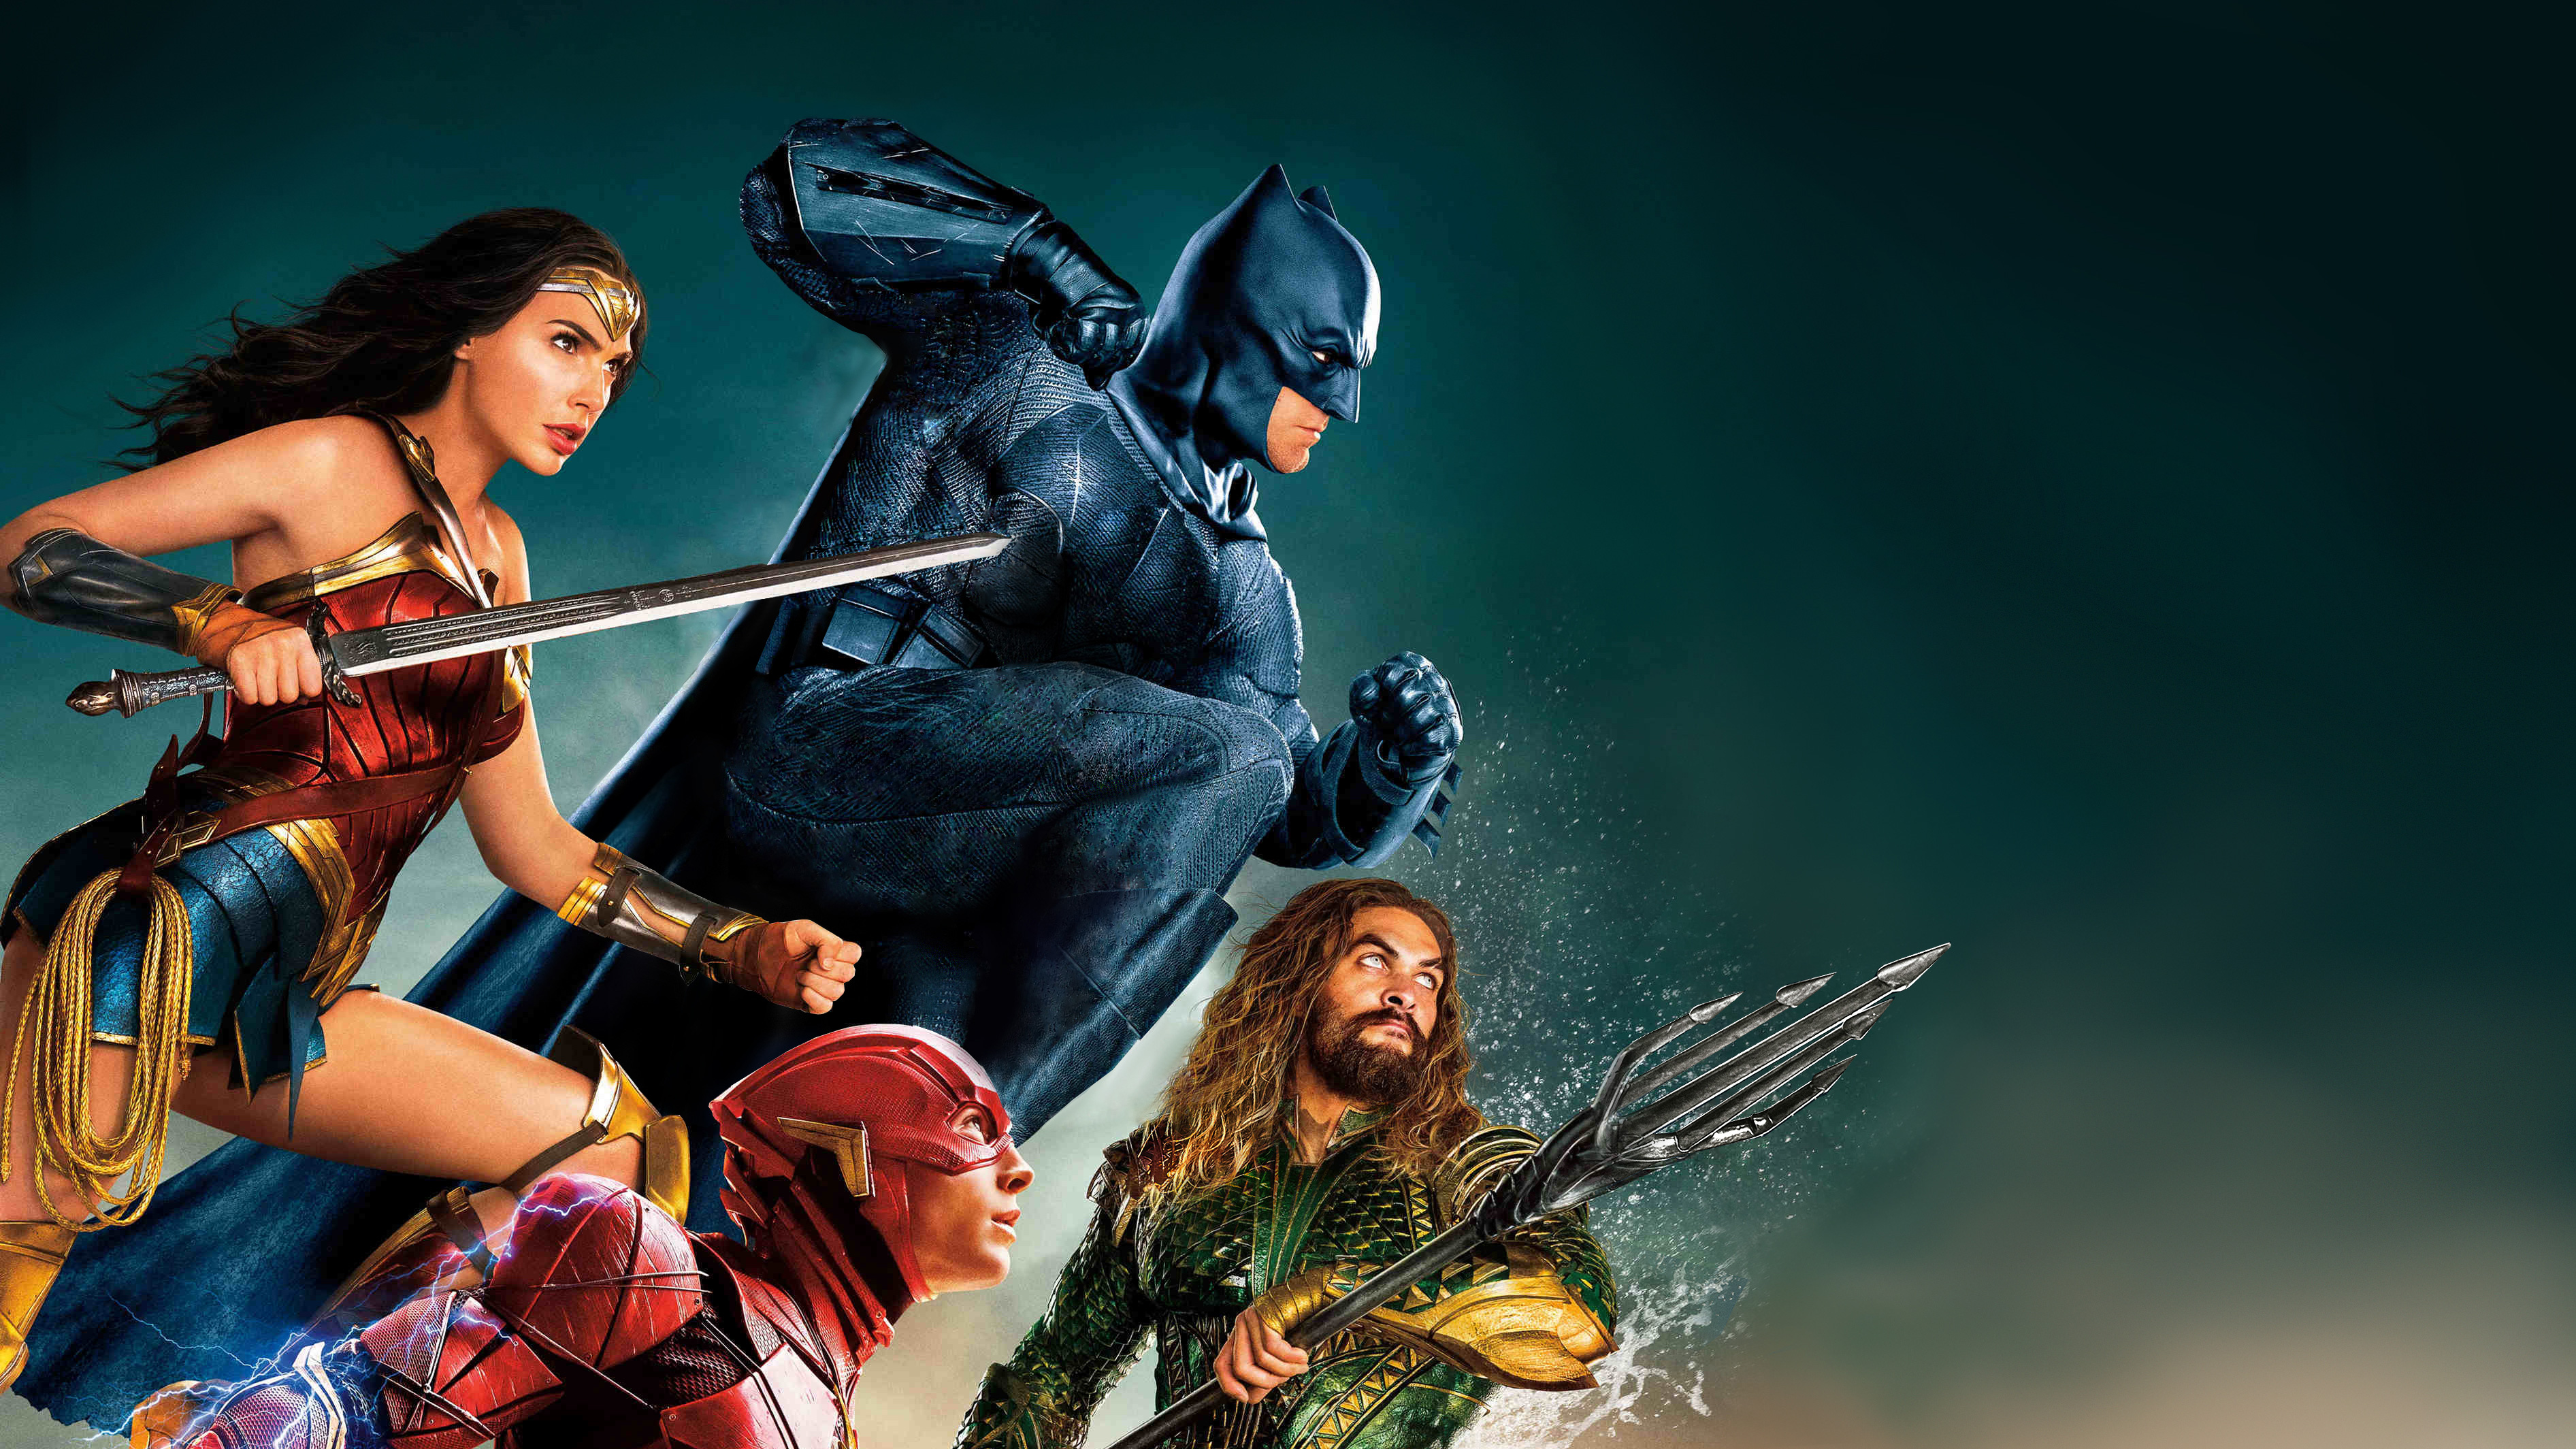 justice league wonder woman batman aquaman flash 4k hd